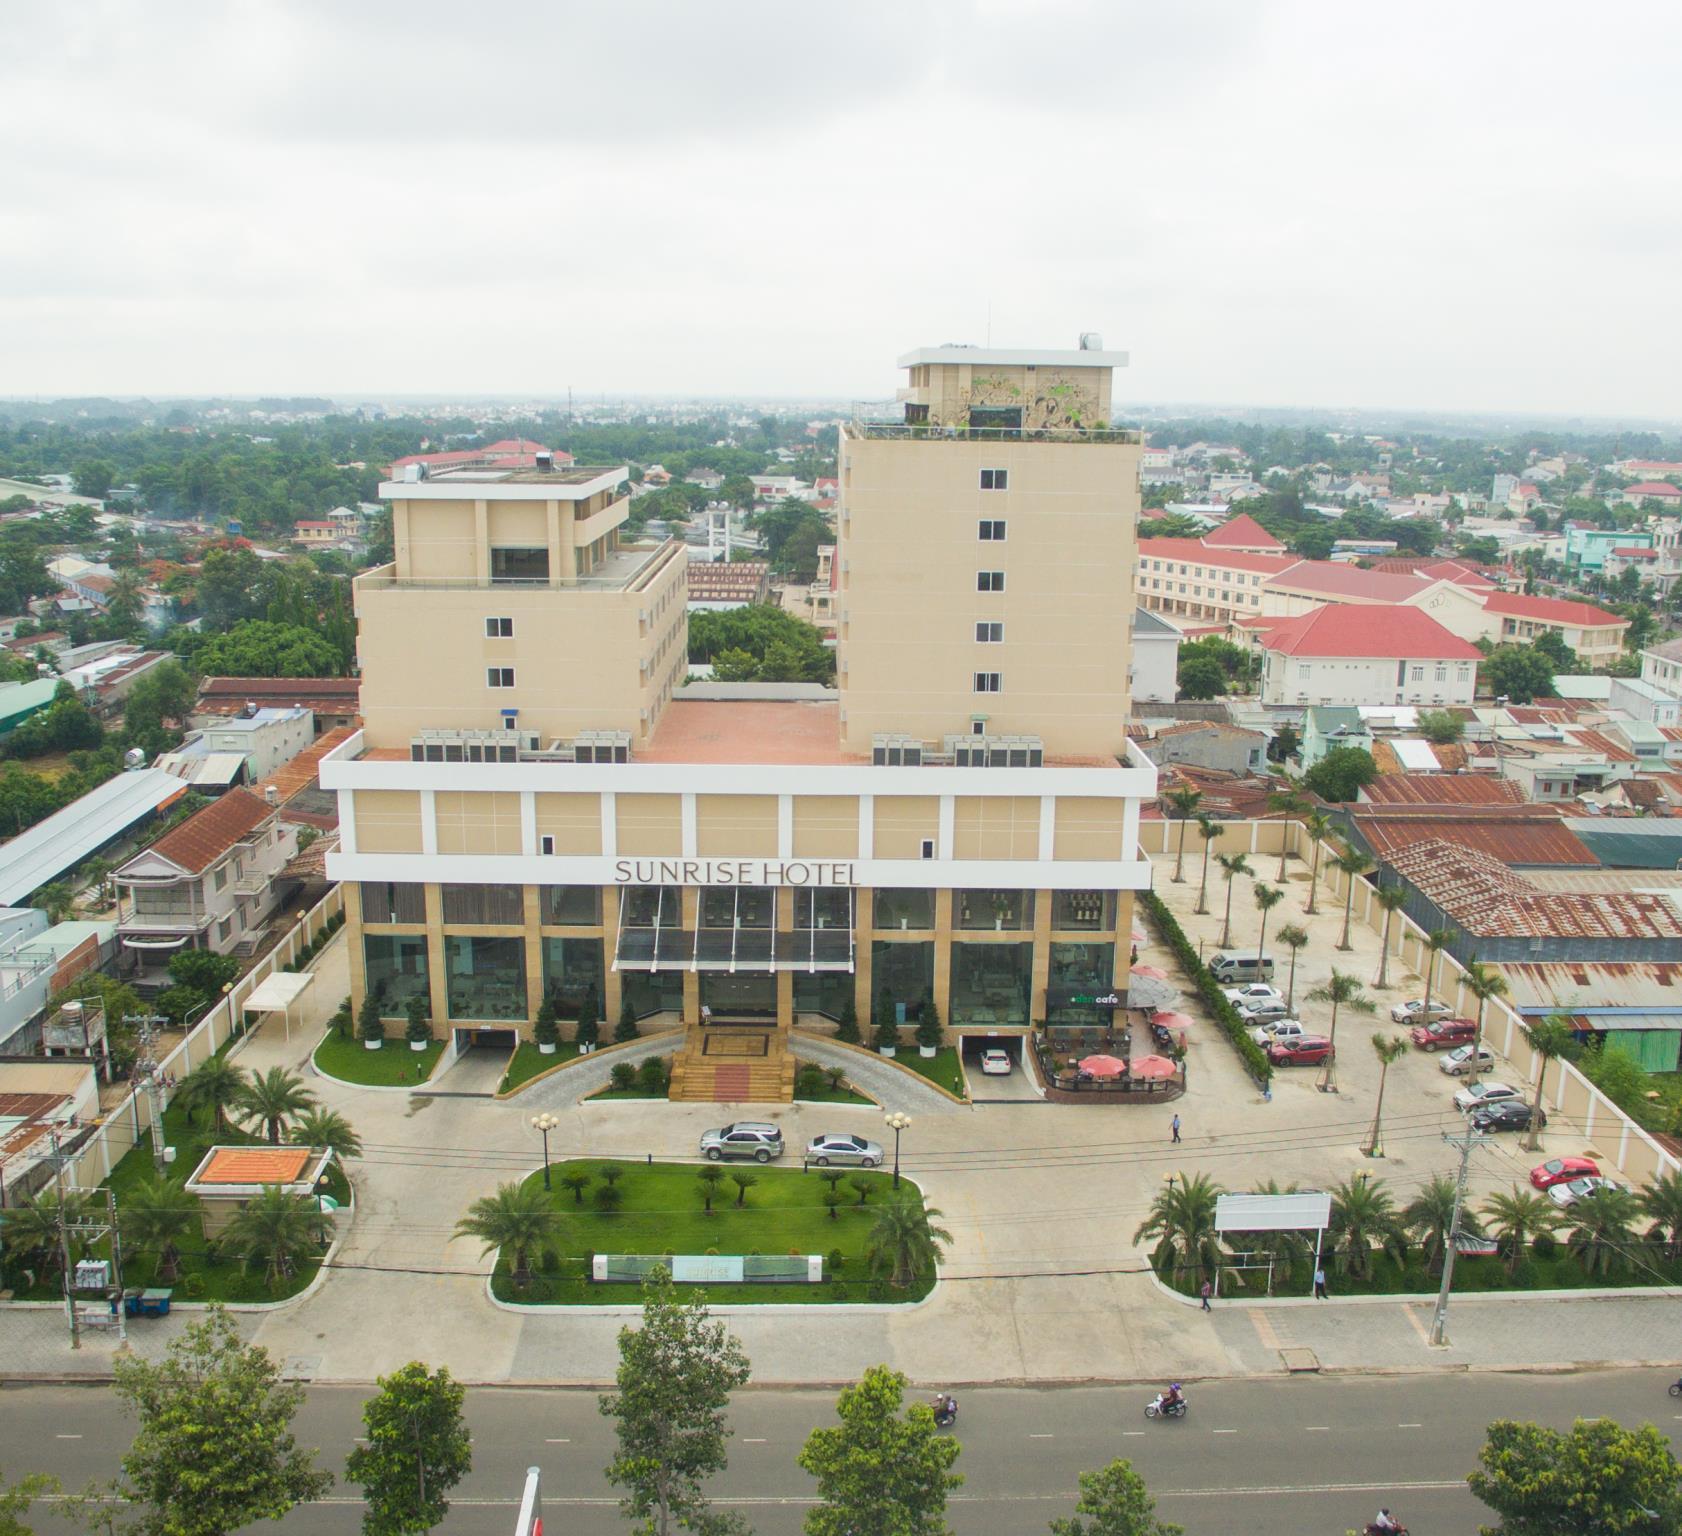 Sunrise Hotel Tay Ninh, Tây Ninh